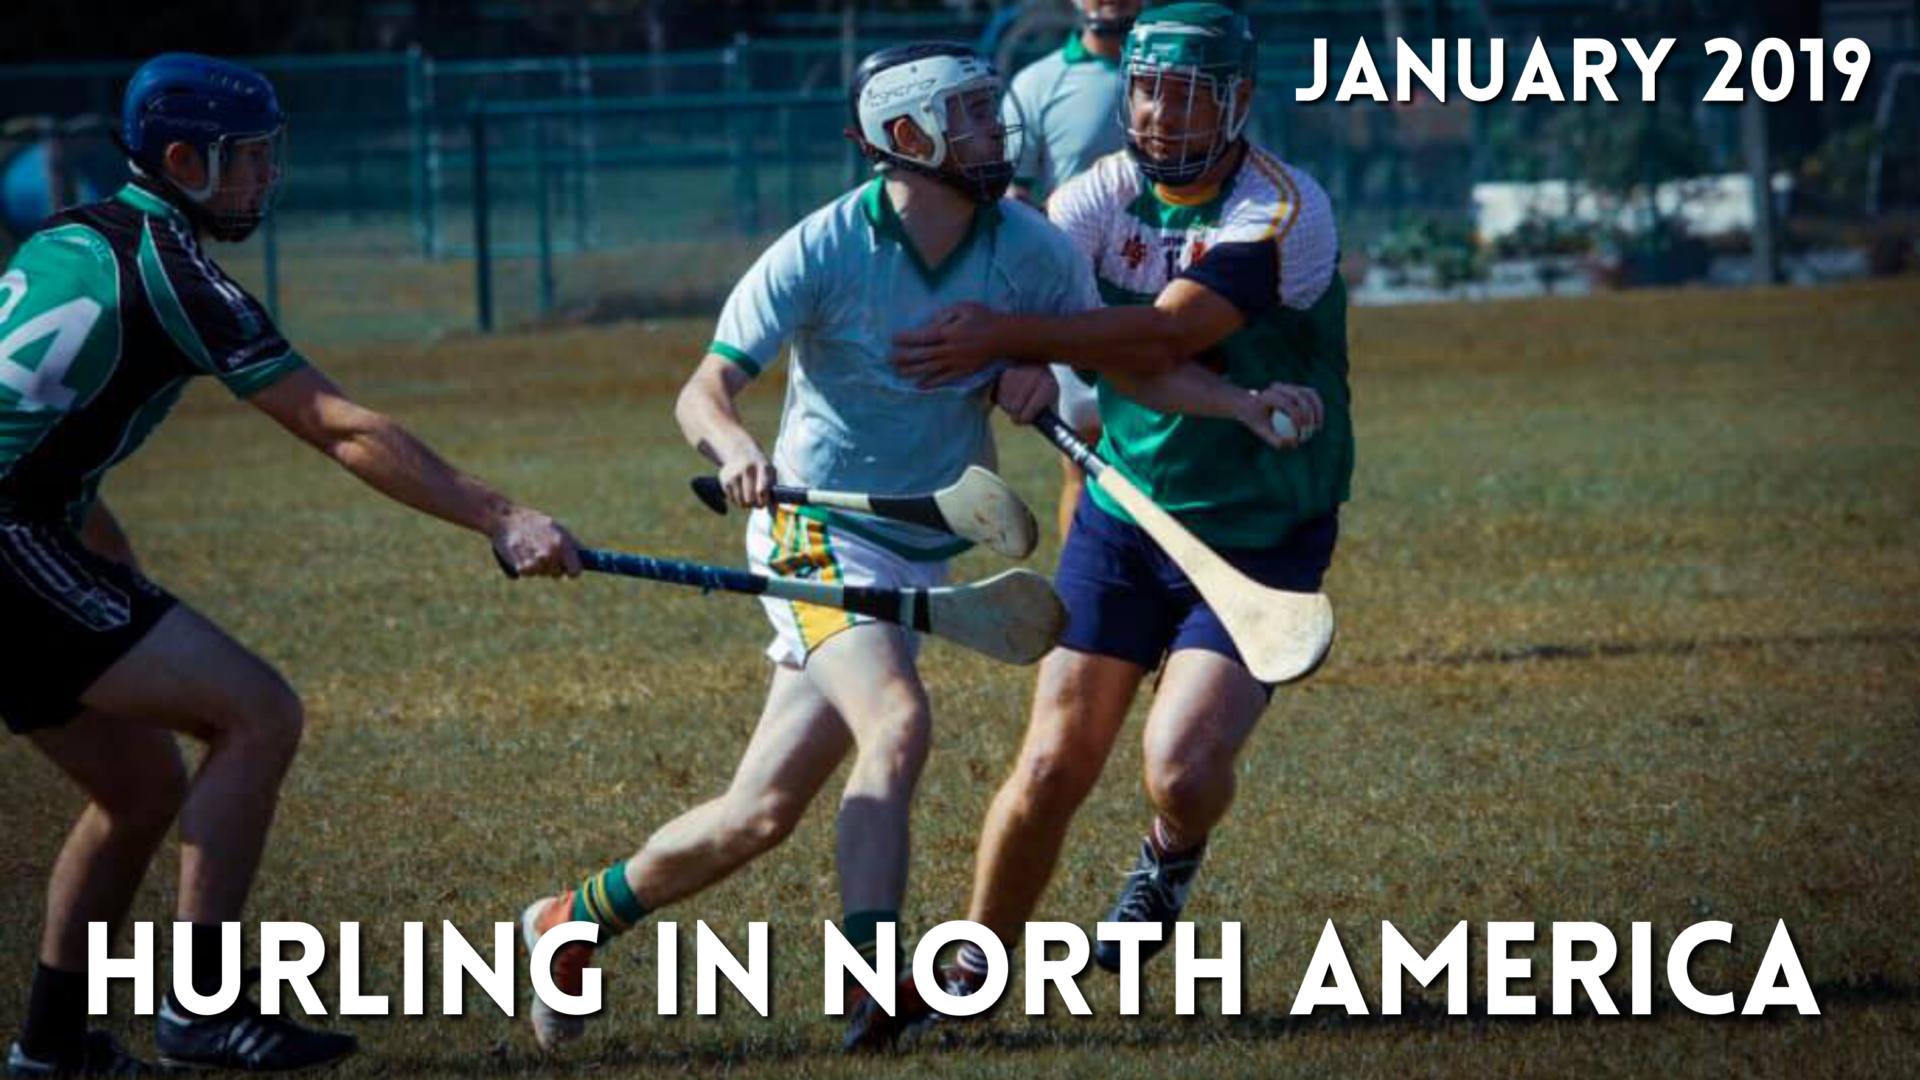 Hurling in North America News | January 2019